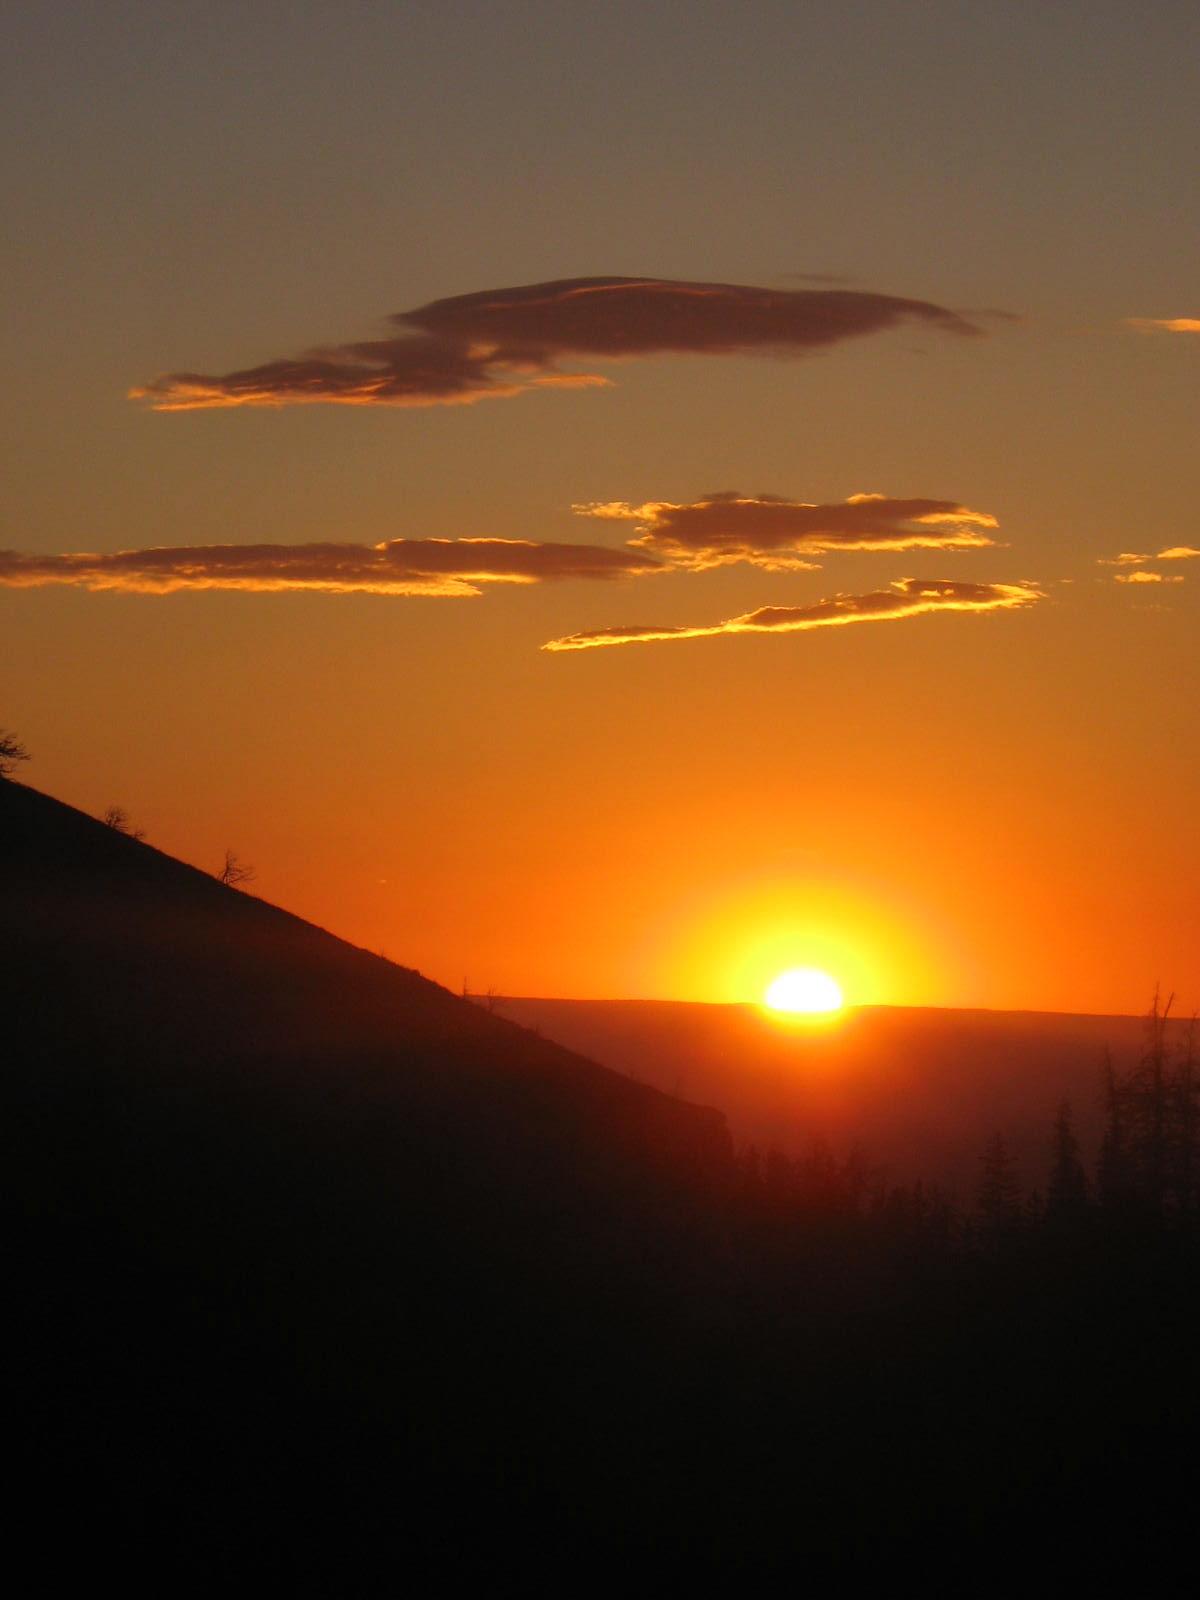 Sunrise over Yellowstone